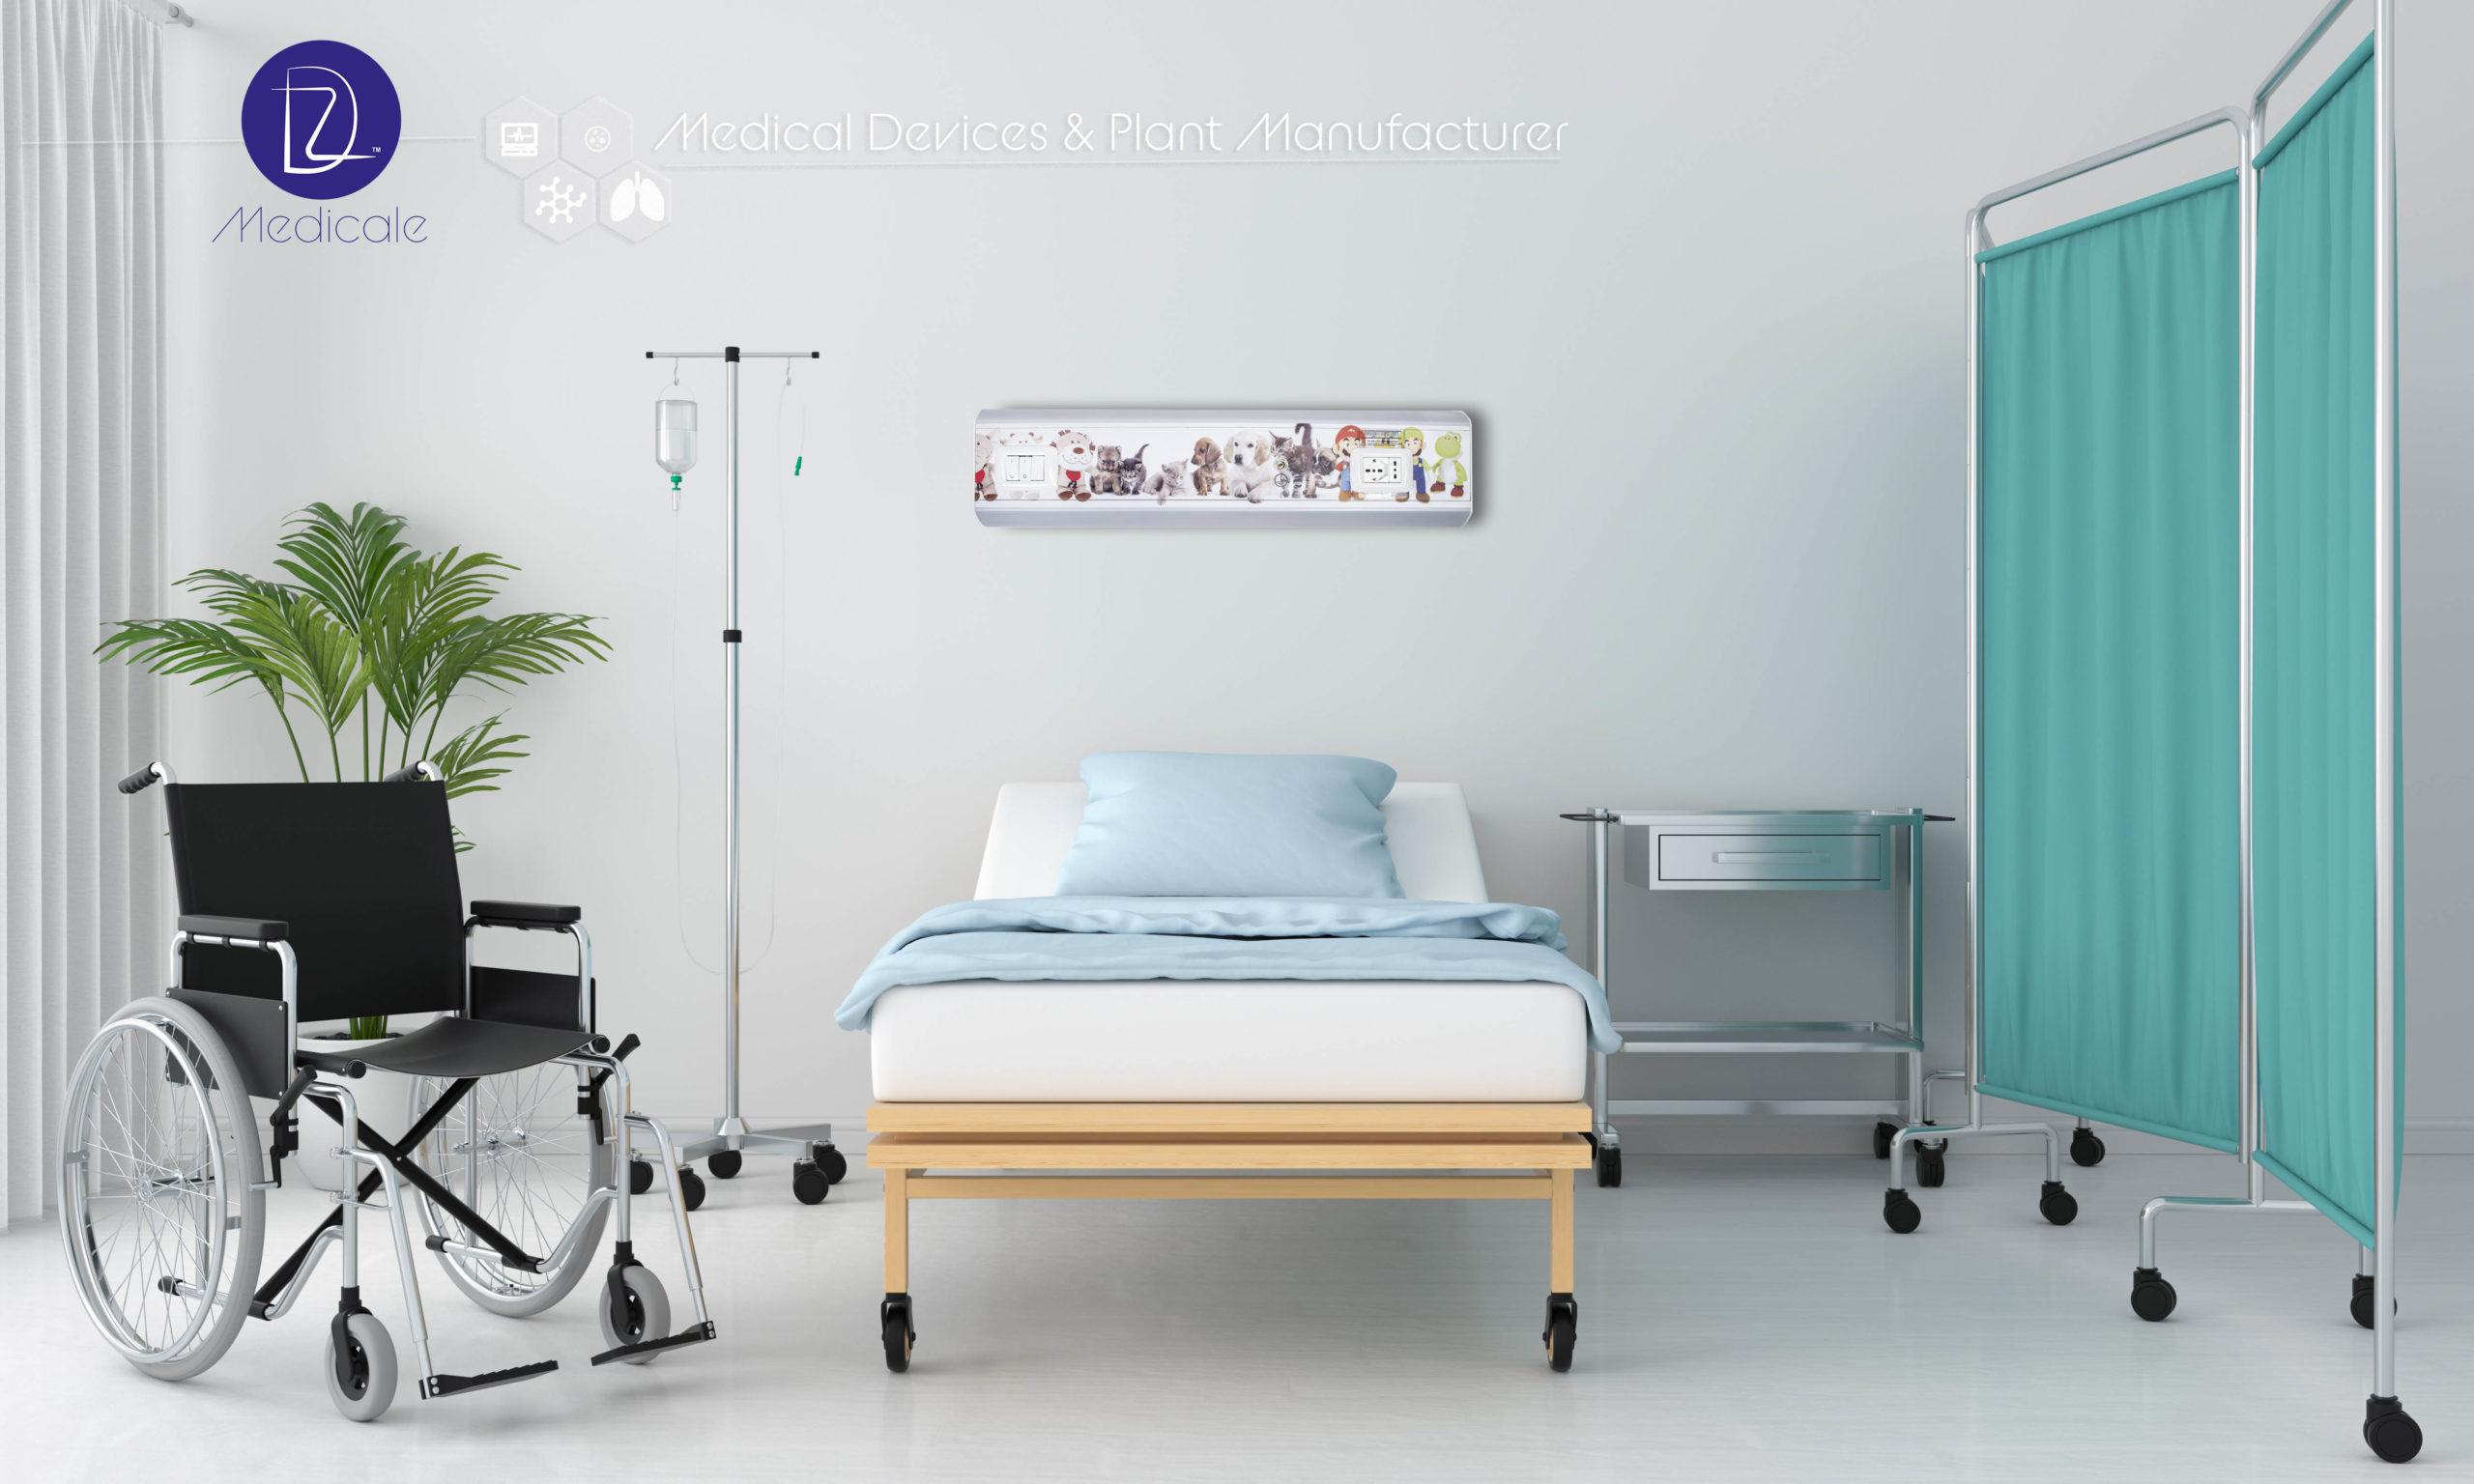 Dz Medicale - BHU Mario custo